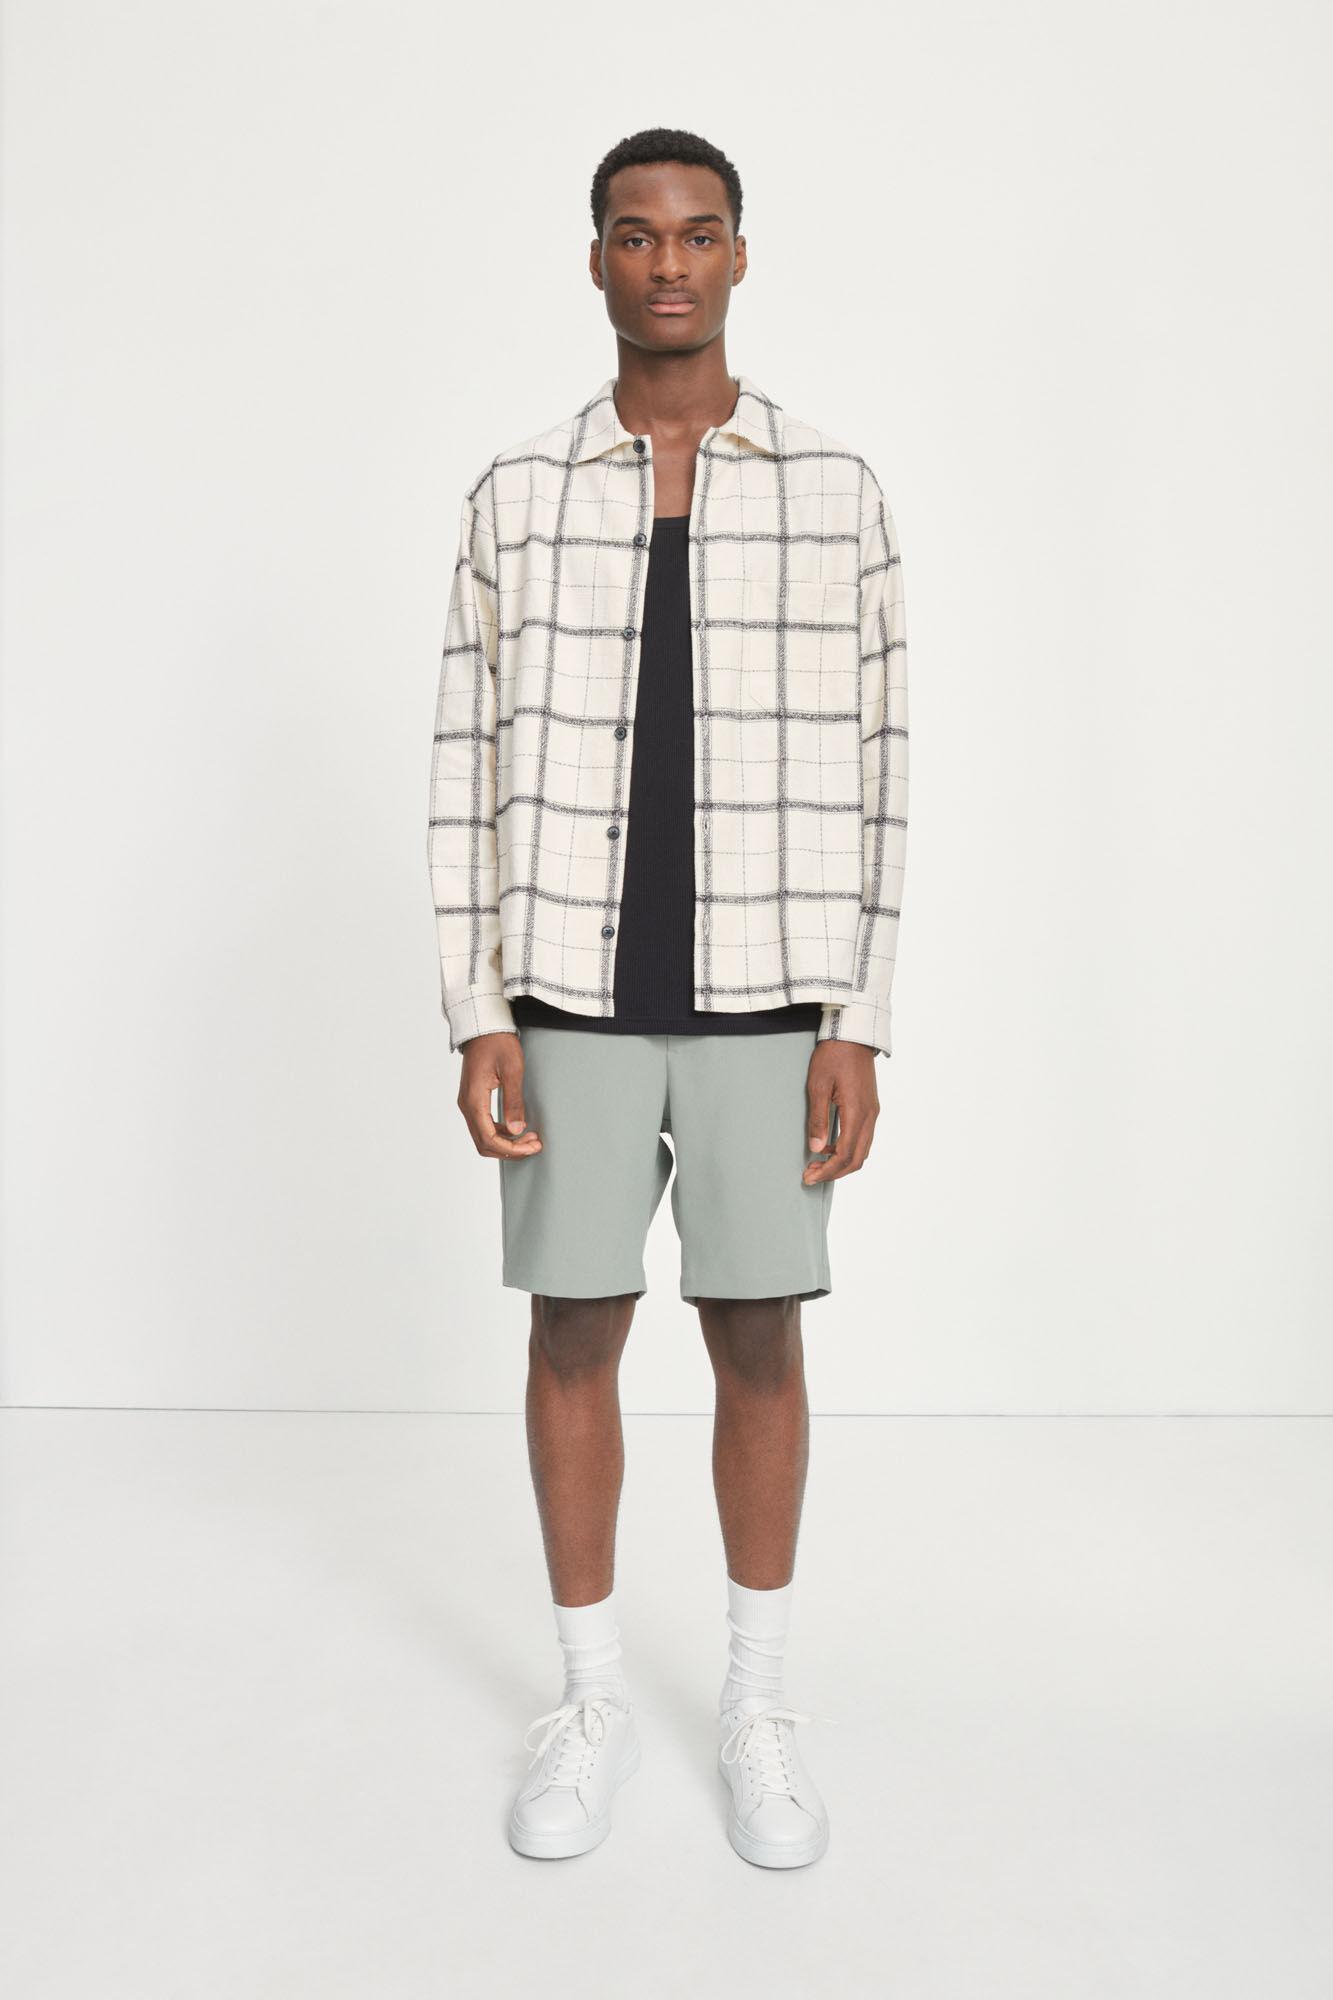 Castor Checker Overhemd Crème Wit 14046-2